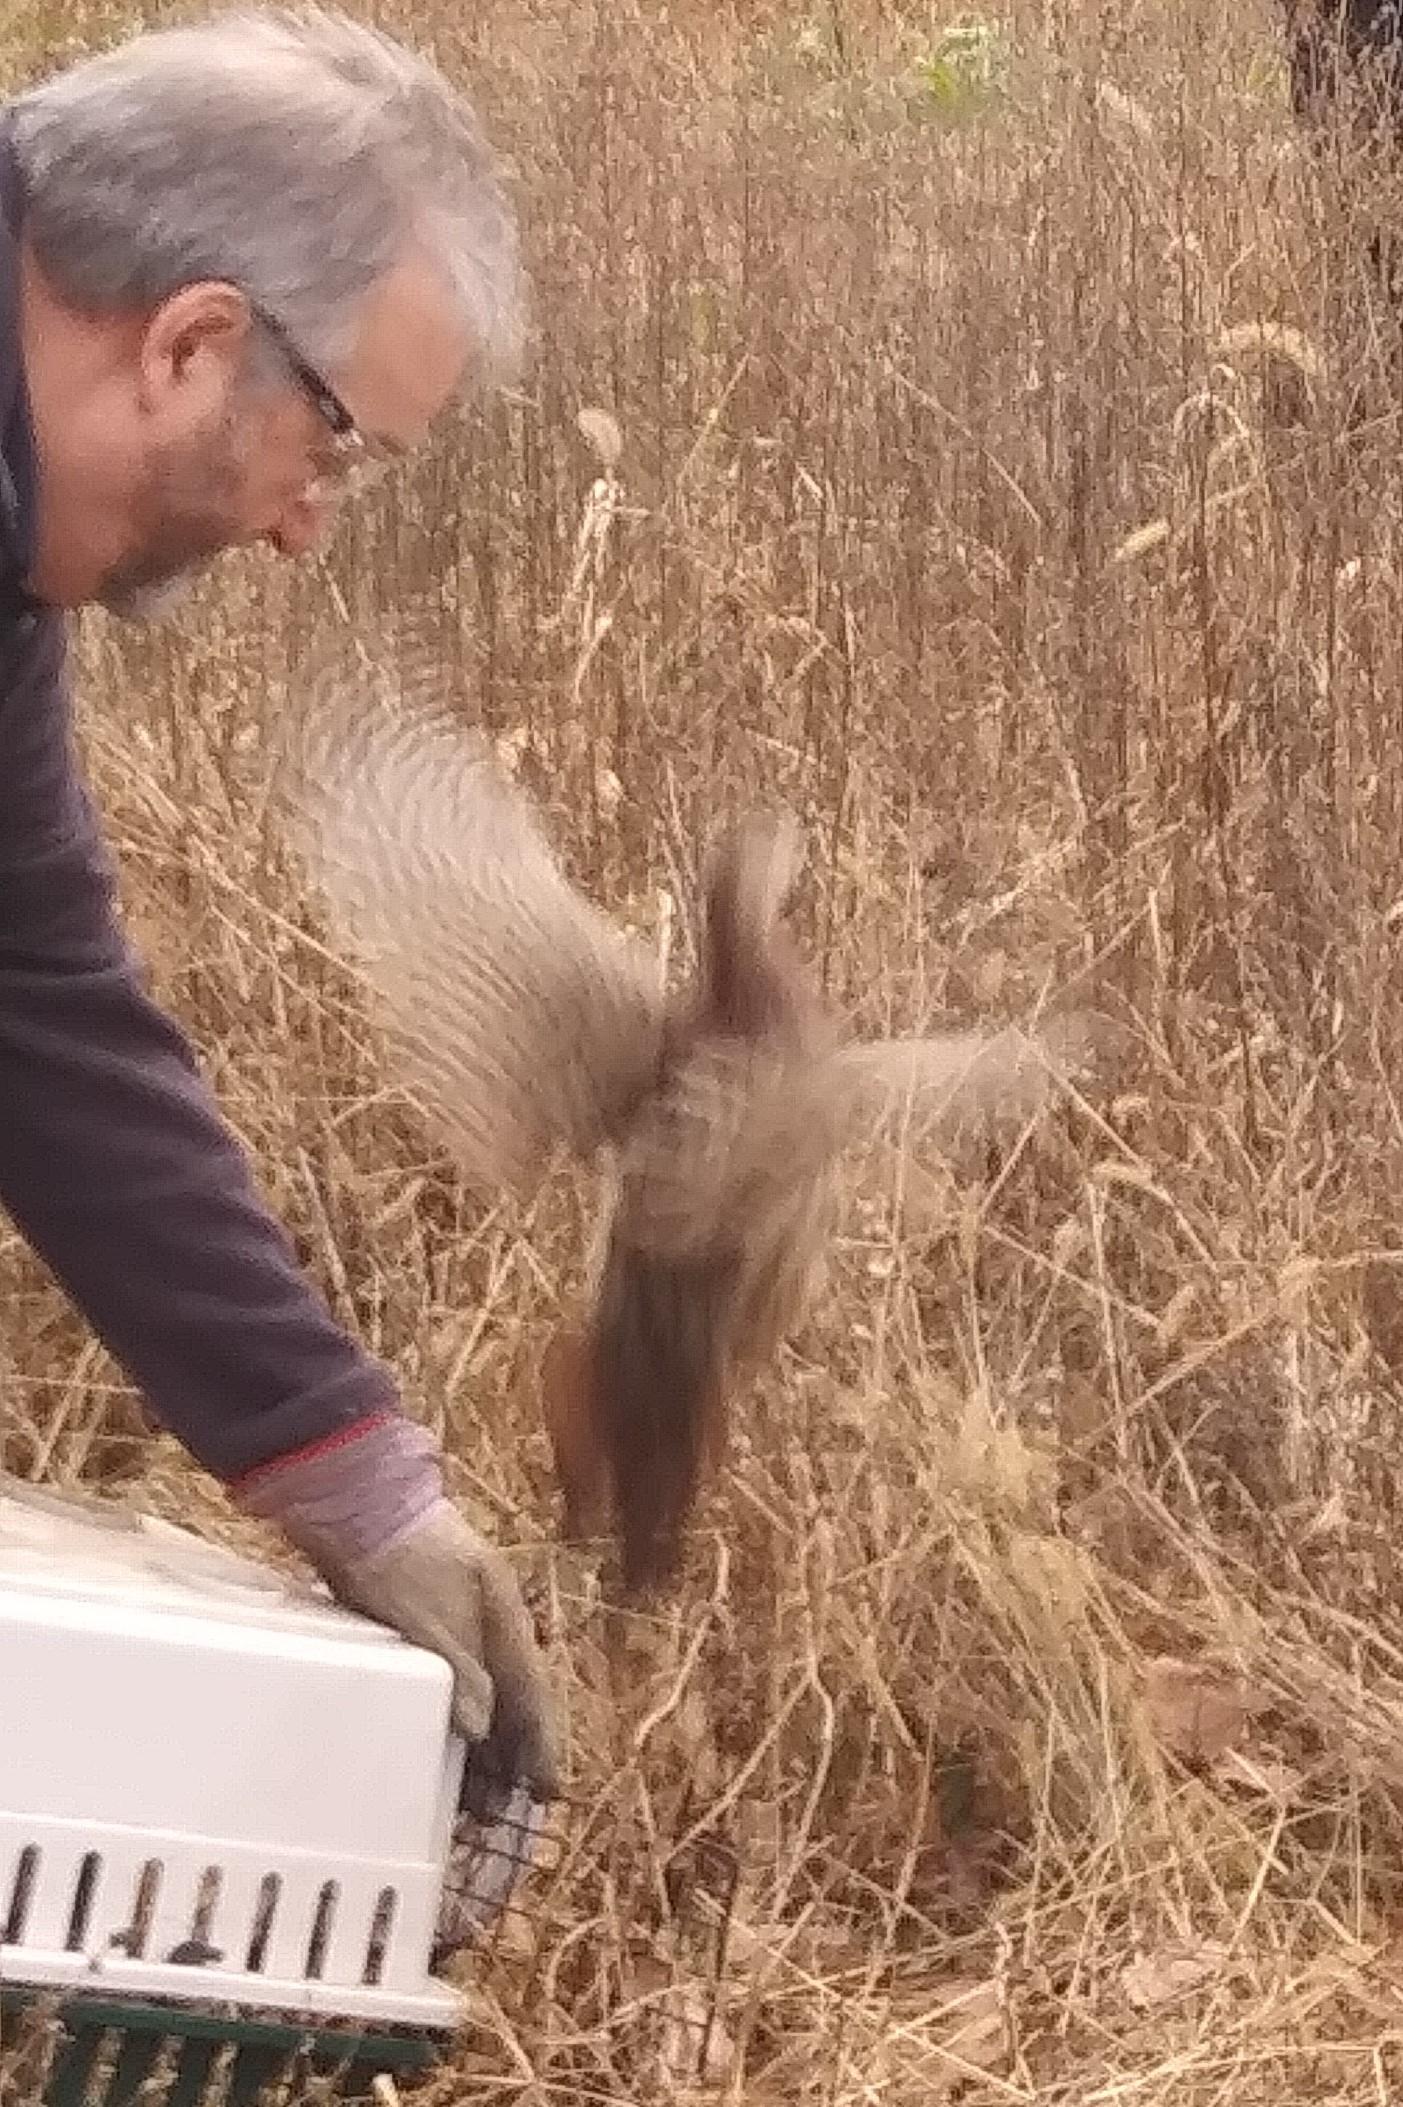 Pheasant release